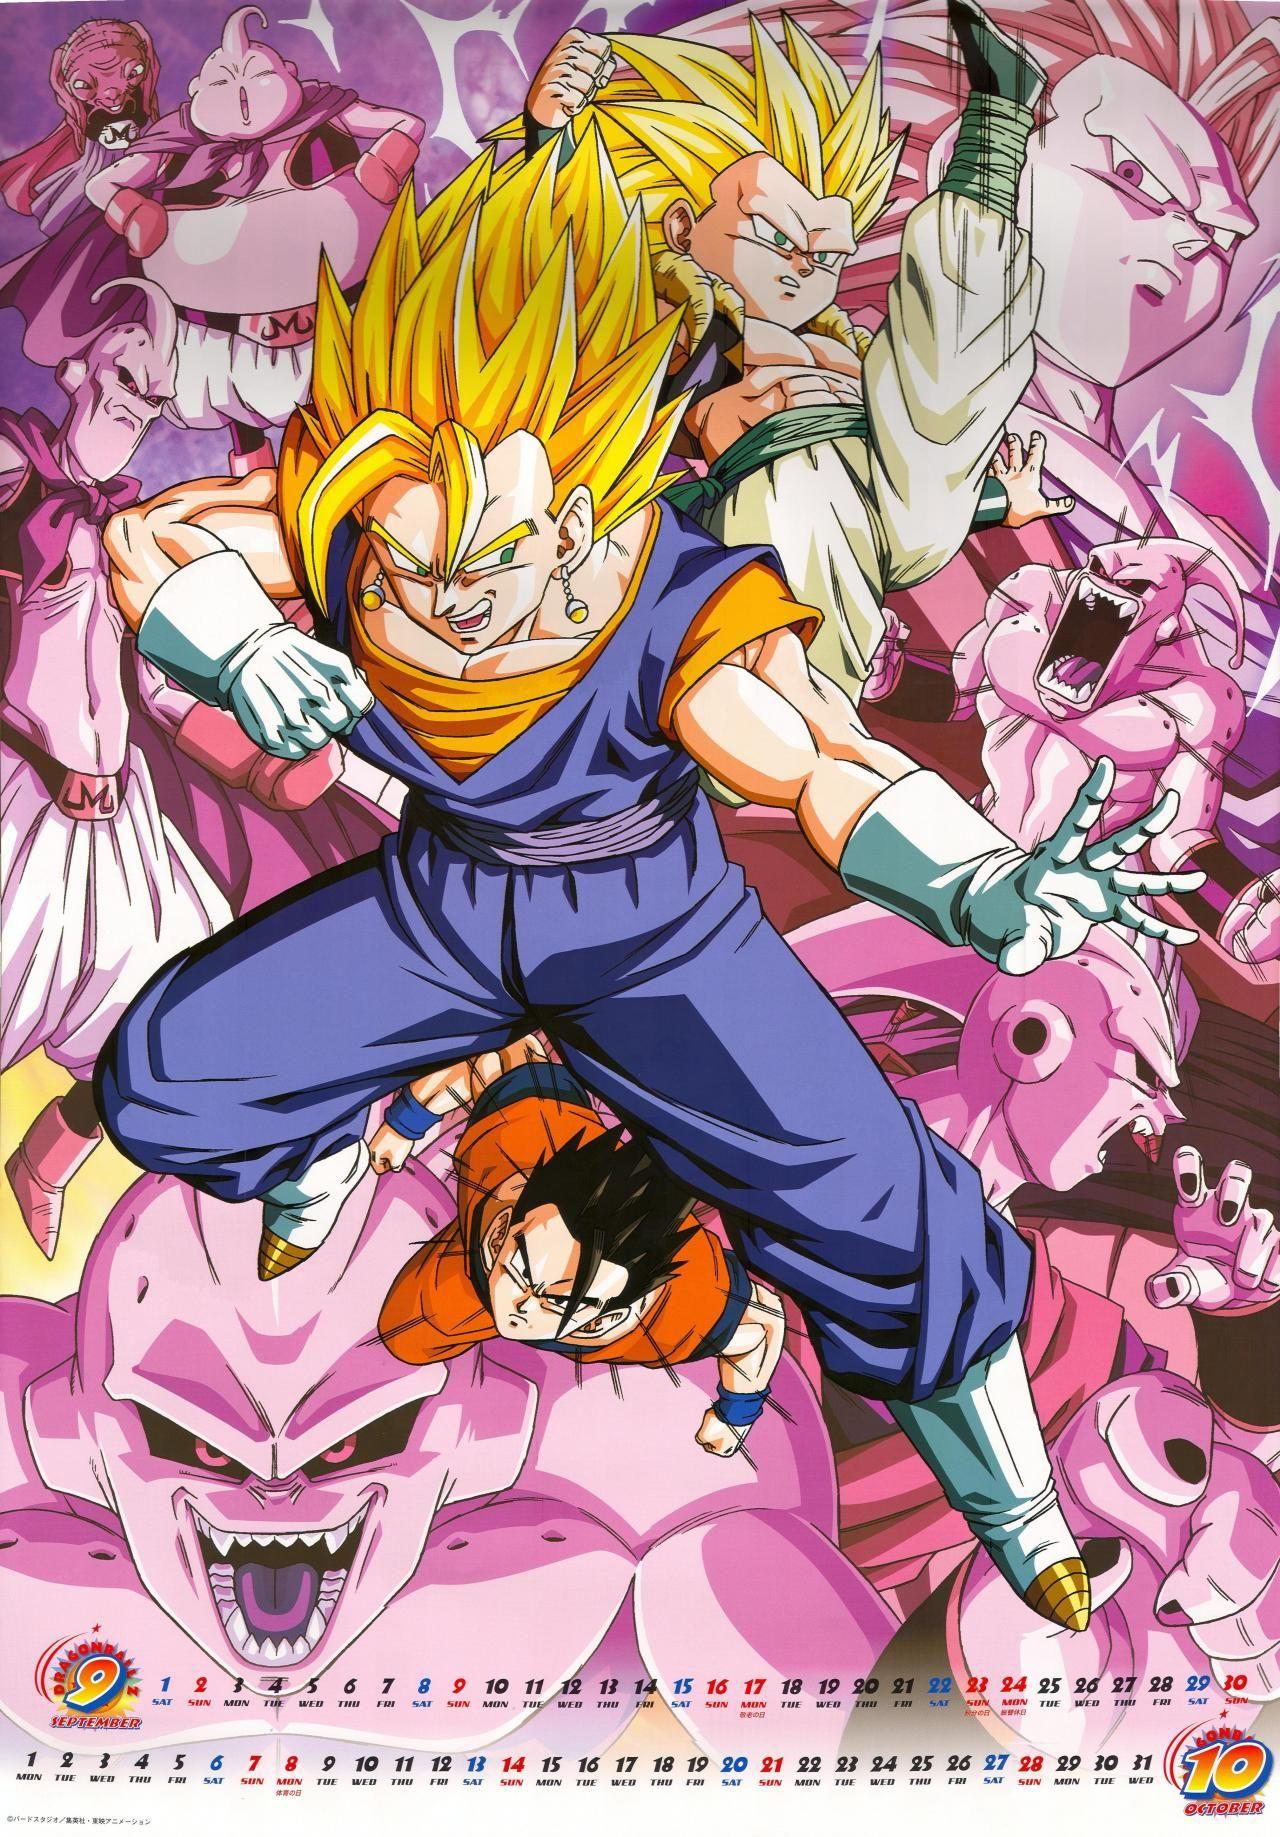 Dragon Ball Z Saga Majin Boo 162 Personajes De Dragon Ball Saga De Majin Boo Majin Boo